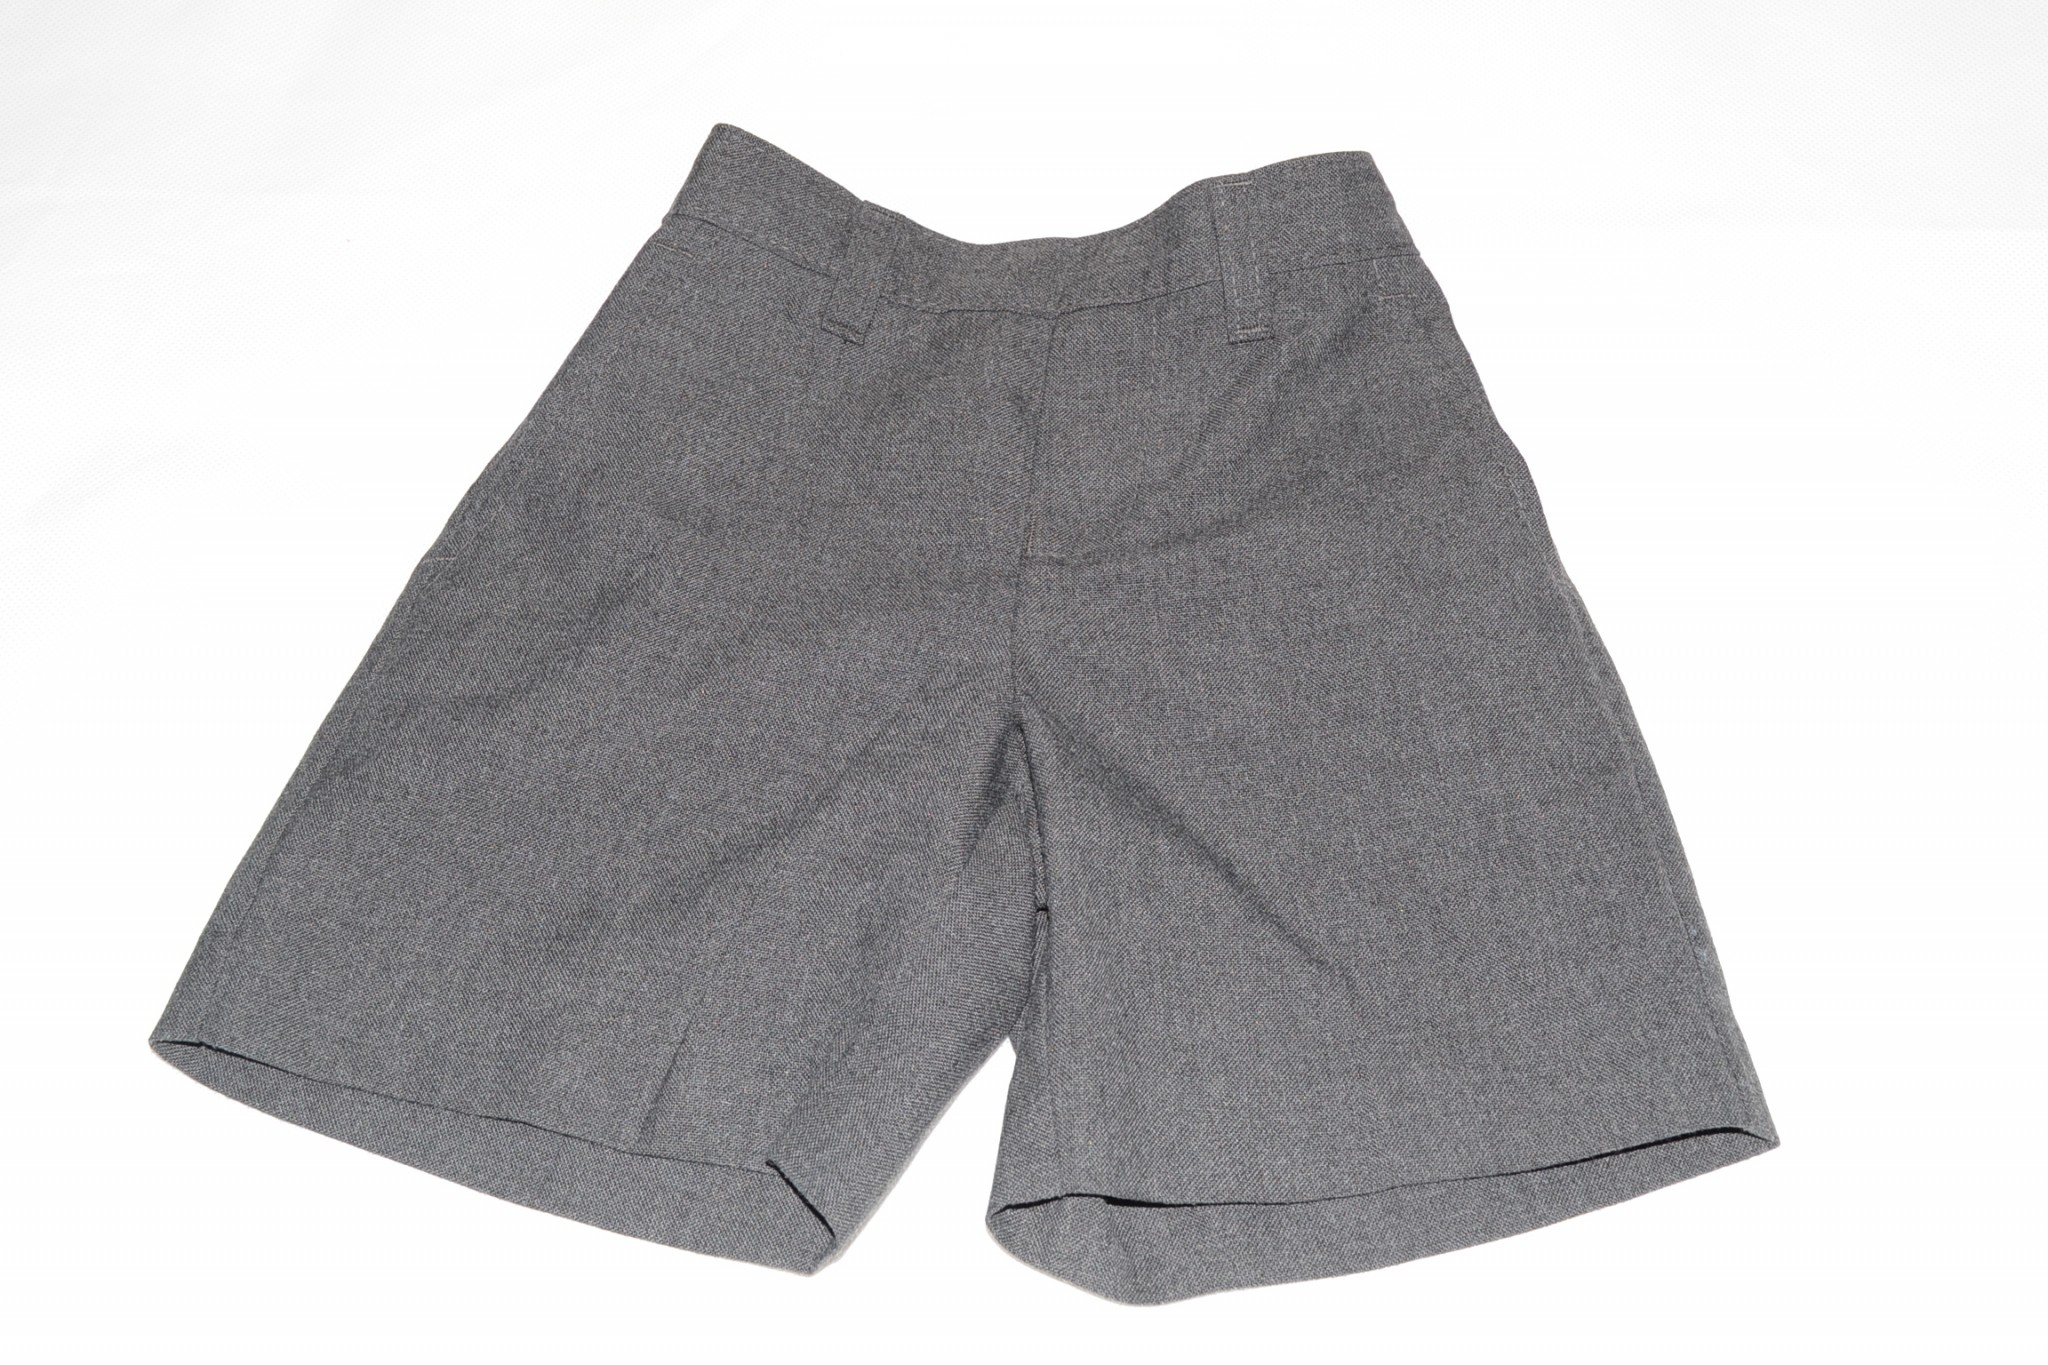 mands shorts